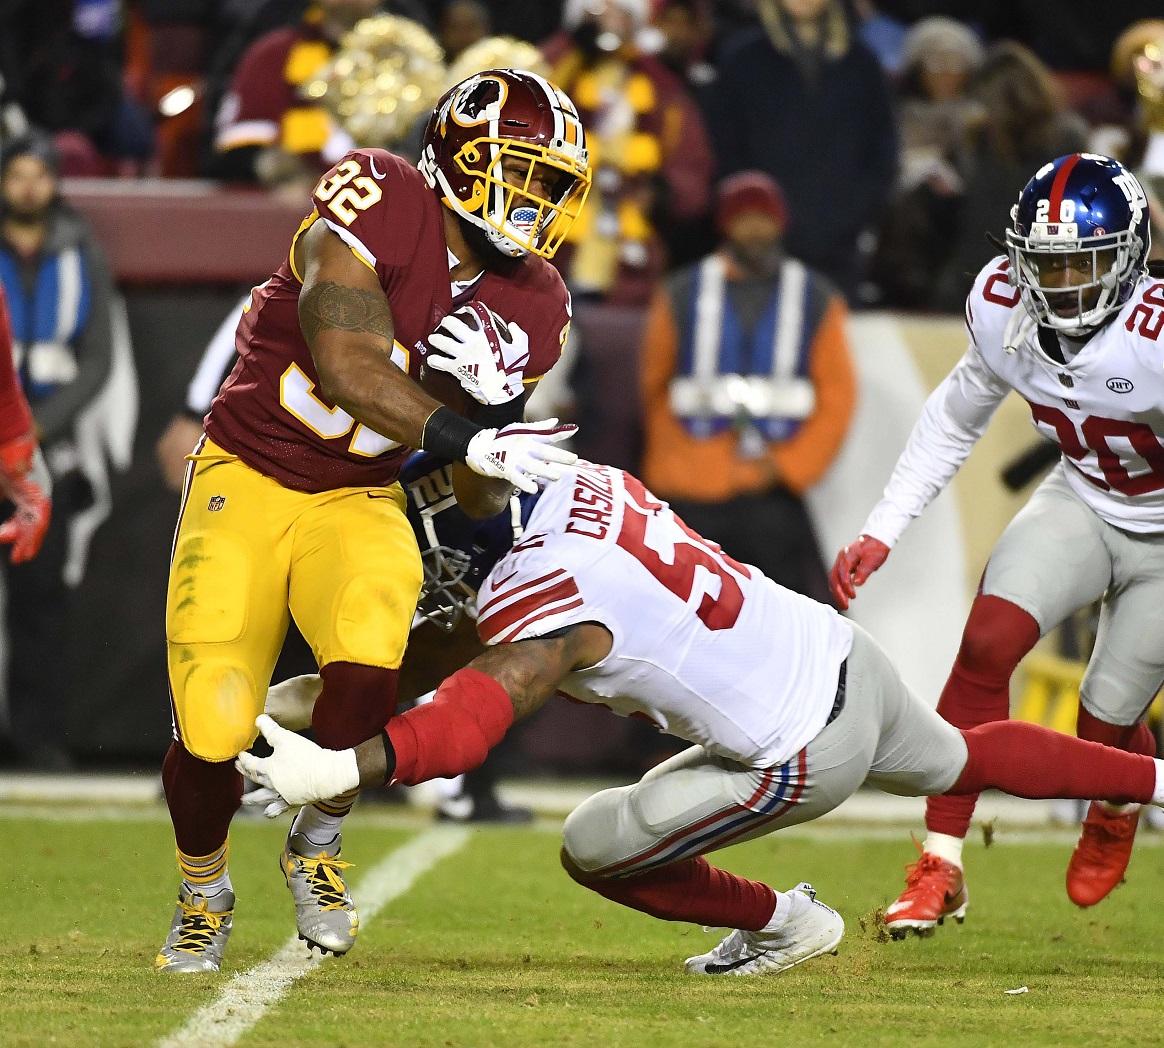 Janoris Jenkins New York Giants RCB NFL and PFF stats